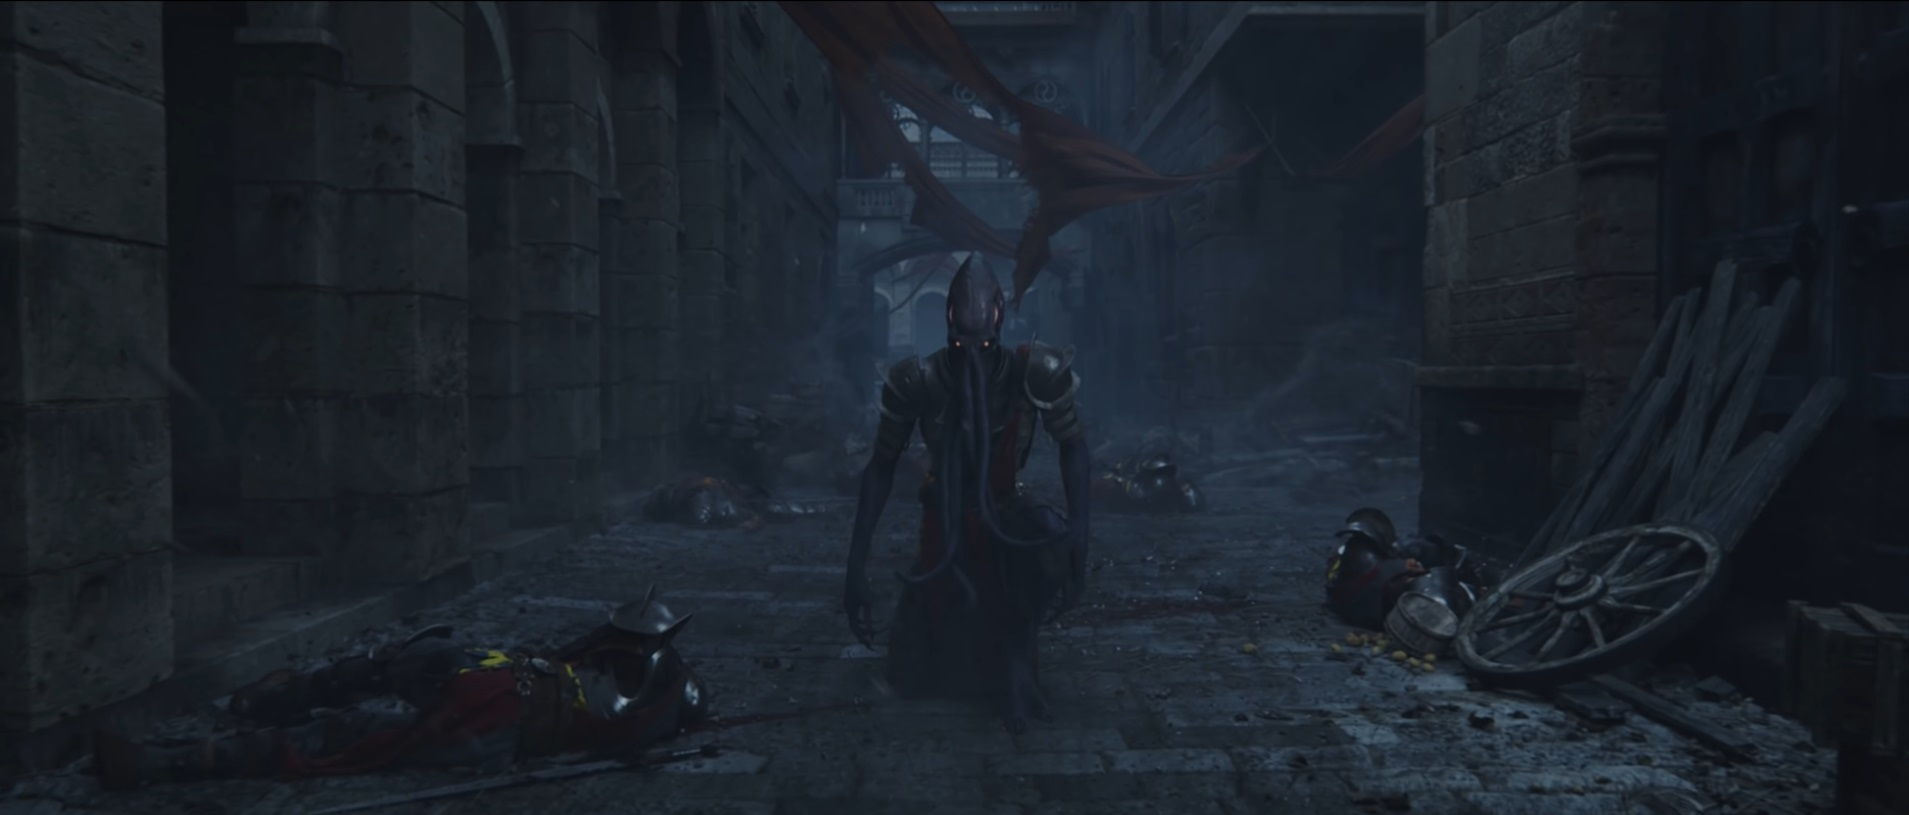 Baldur S Gate 3 In Development By Larian Studios Mspoweruser